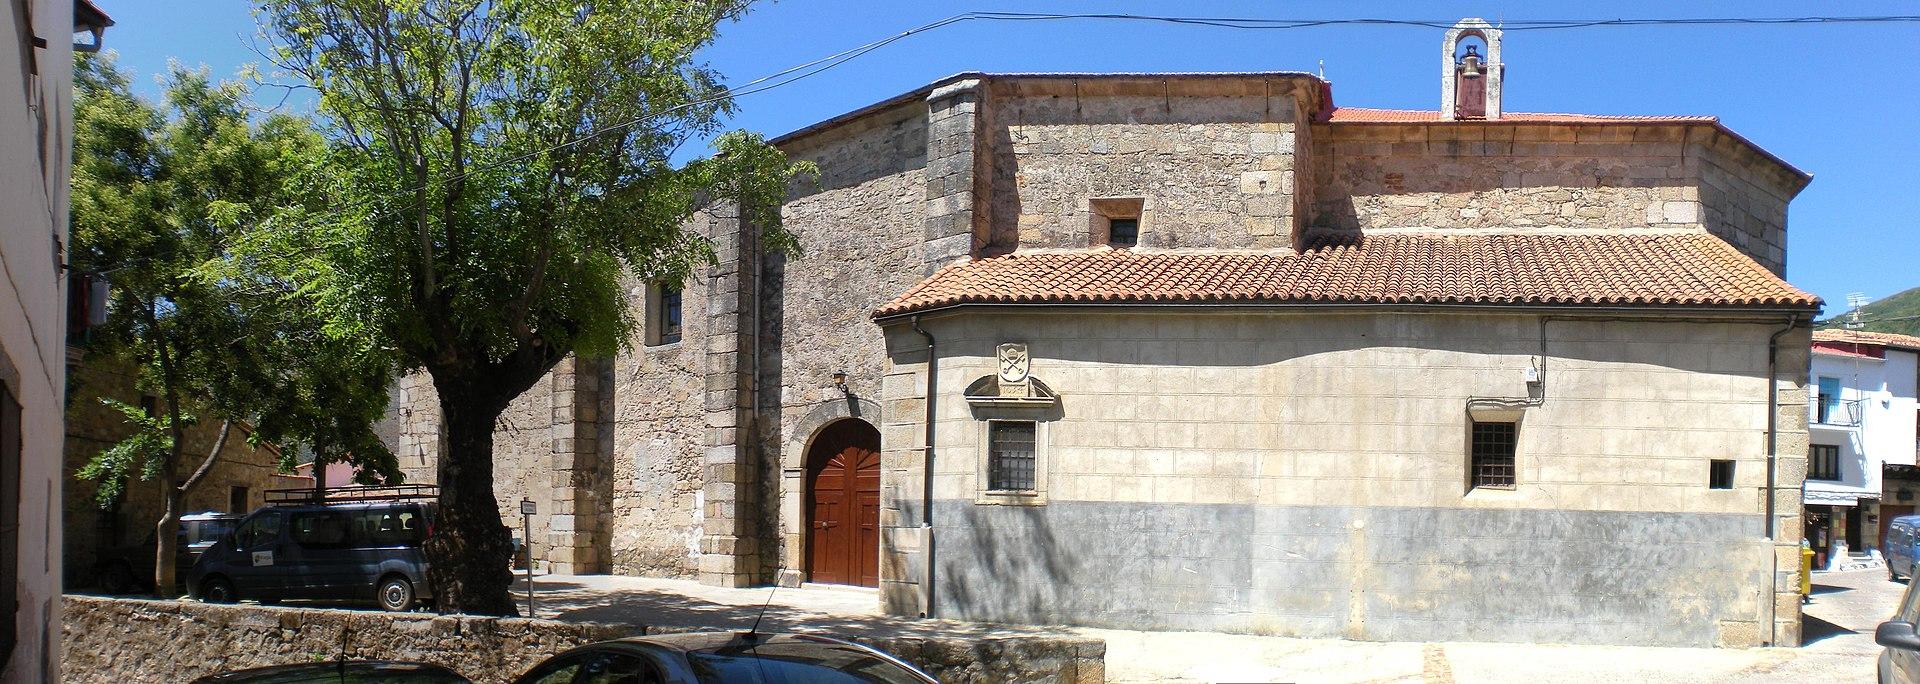 Cáceres.2009.Iglesia de San Martín de Trevejo.jpg